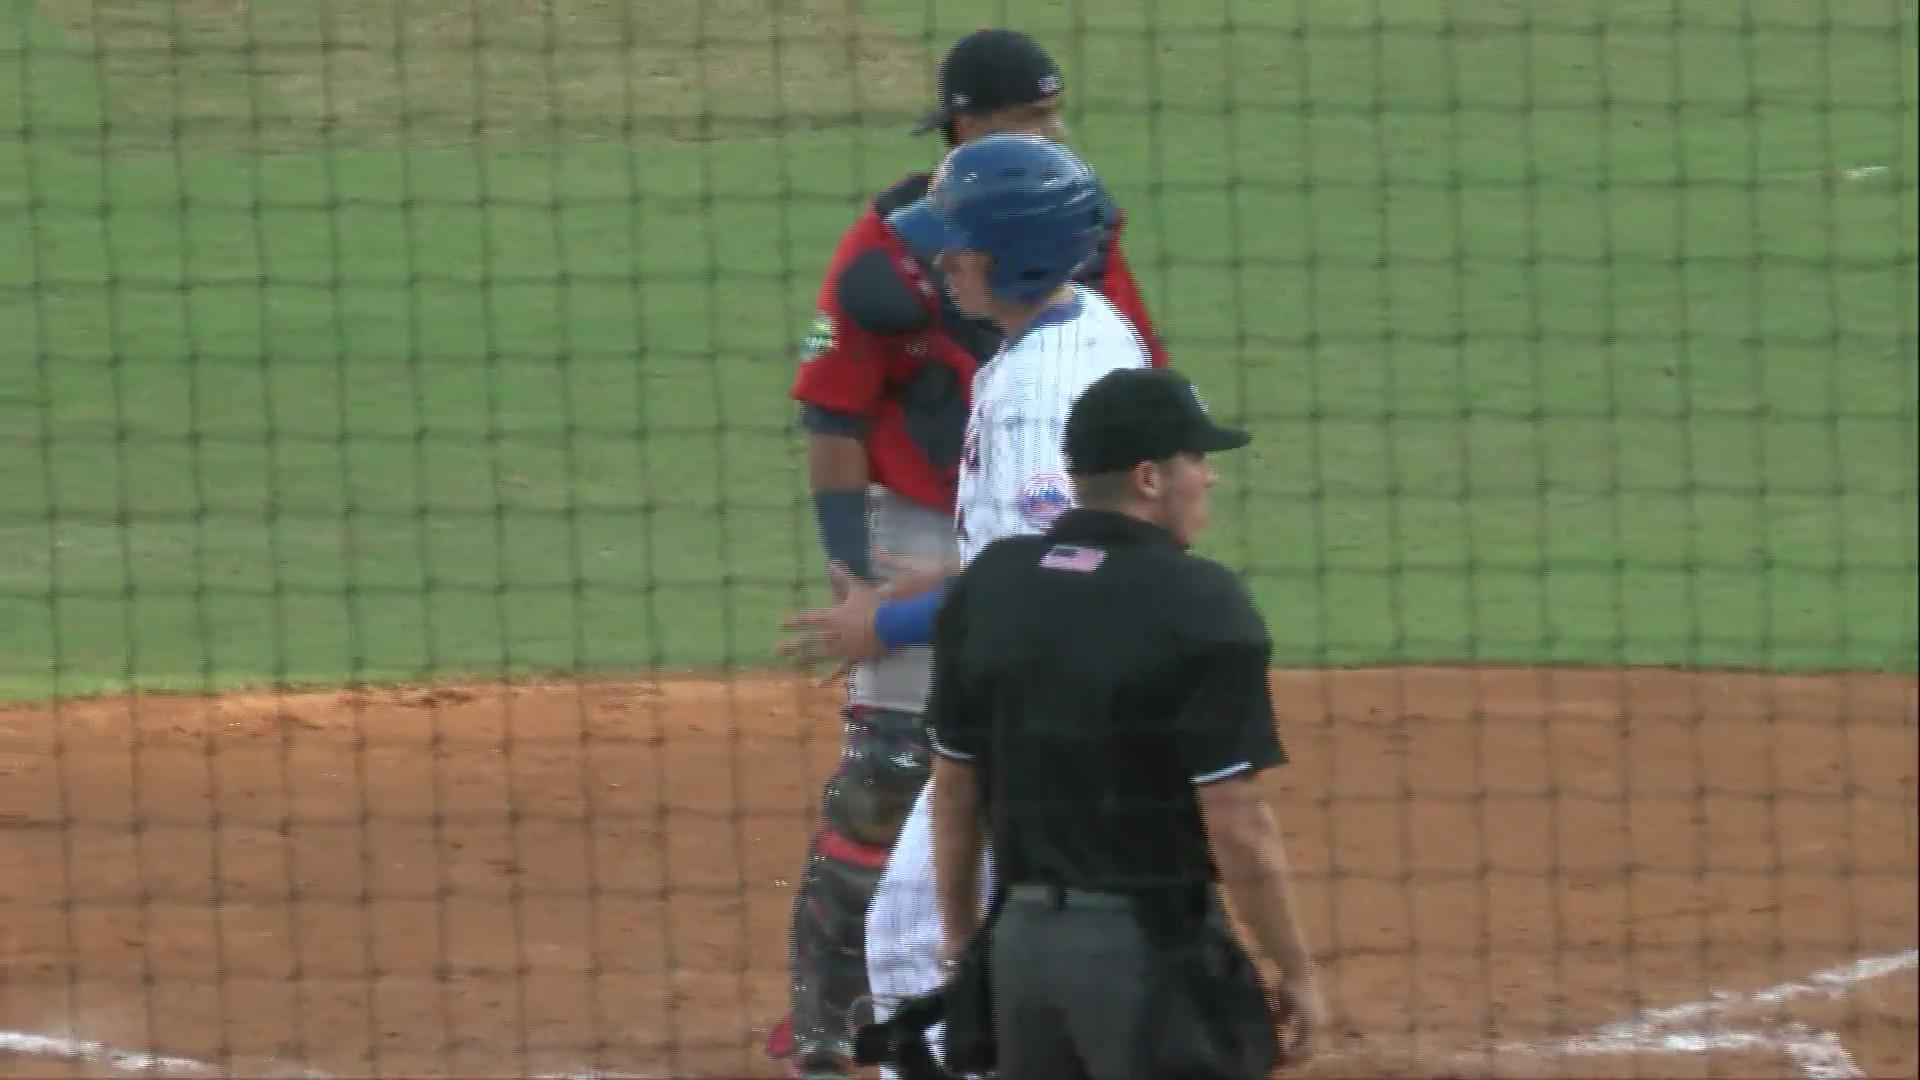 Appalachian_League_Baseball_action_on_Sa_0_20190623034901